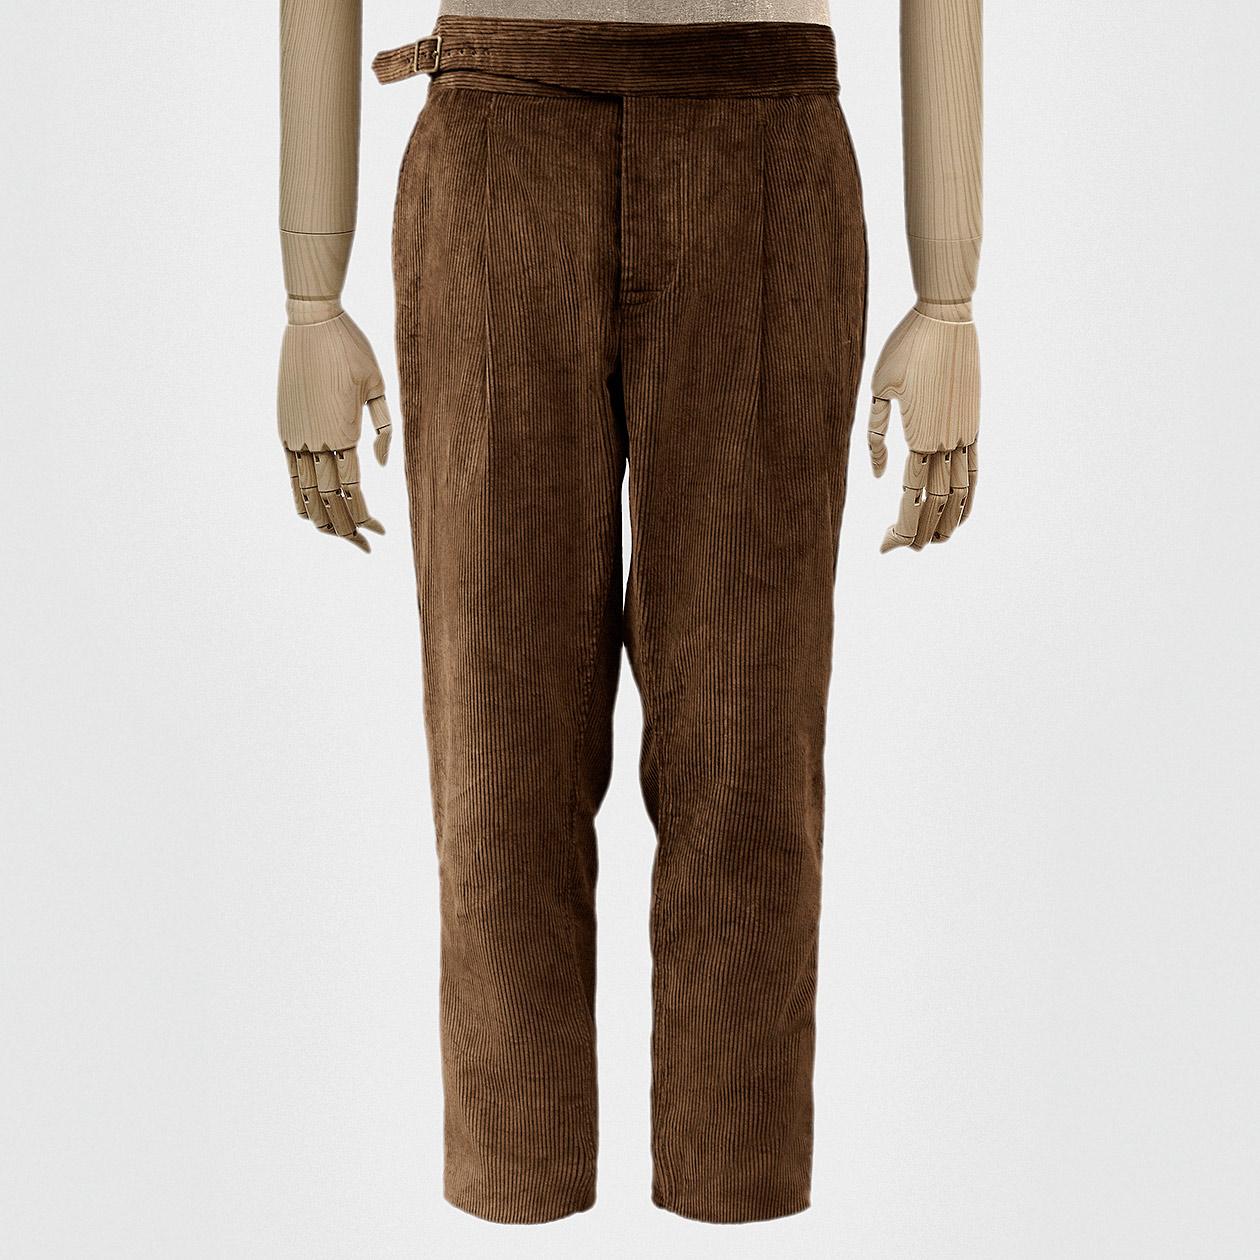 standard-trouser-heavy-corduroy-cedar-1@2x.jpg